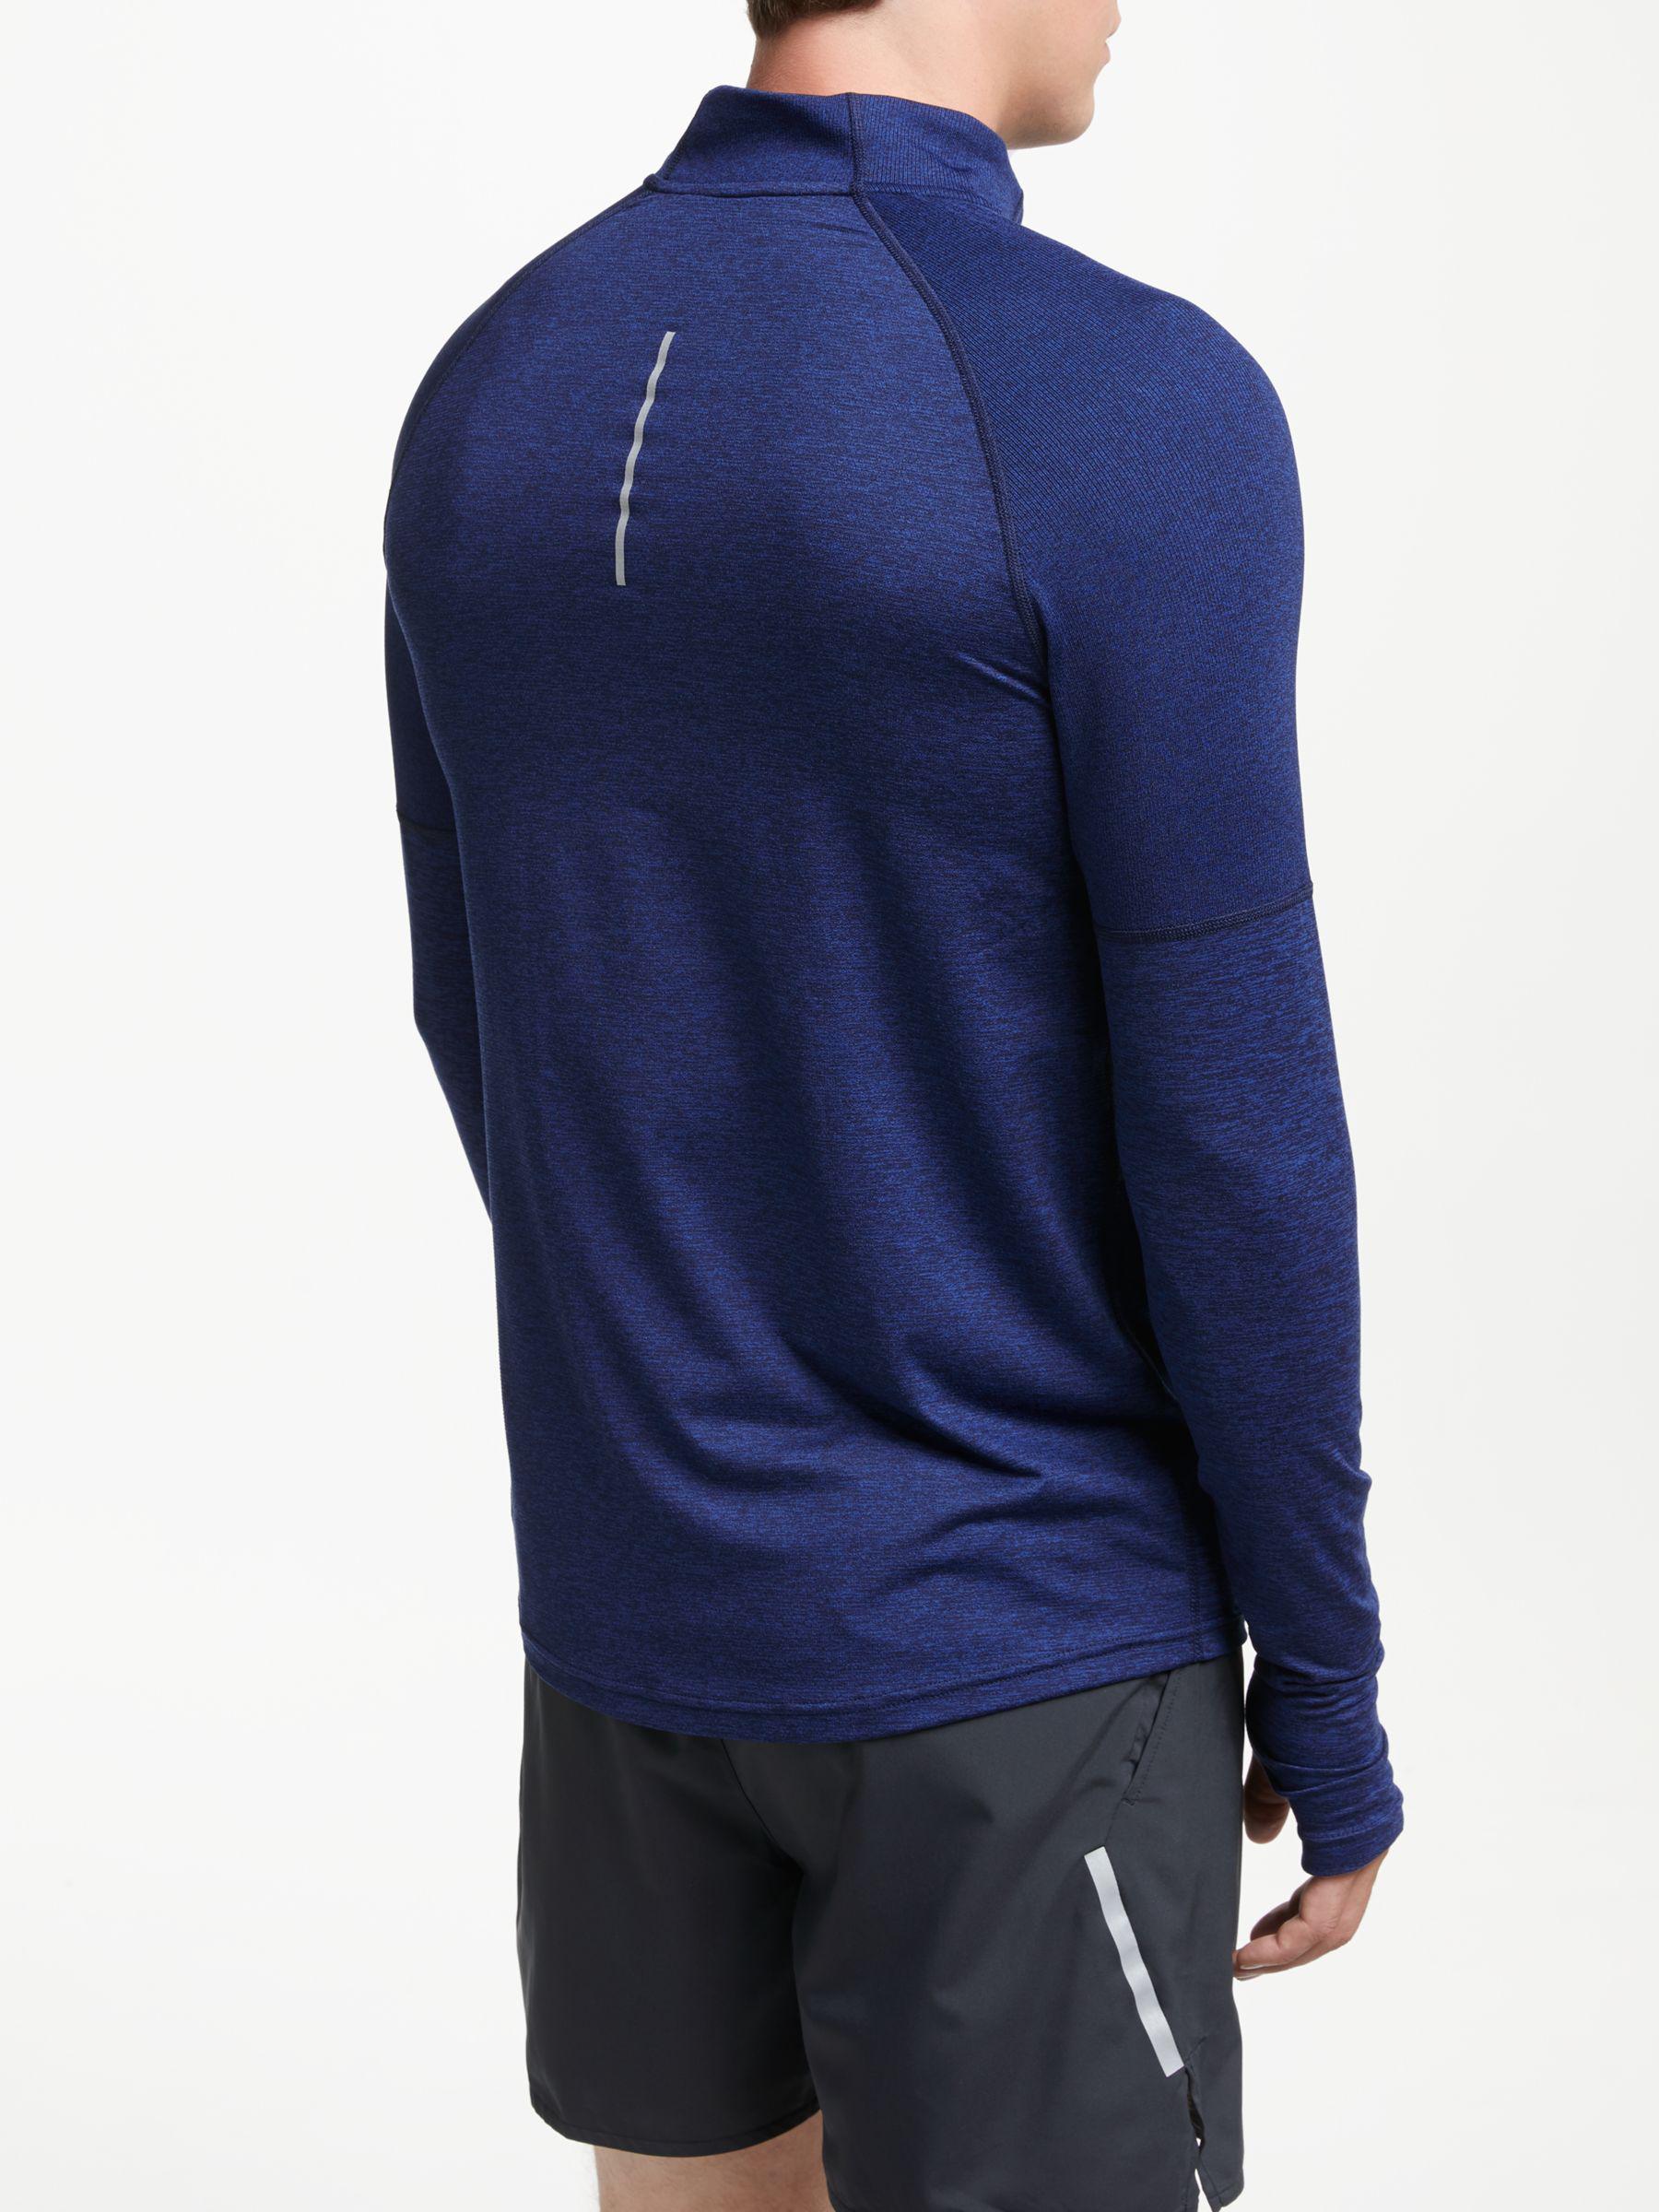 5360e0d56d0c Nike Dry Element 1 2 Zip Running Top in Blue for Men - Lyst